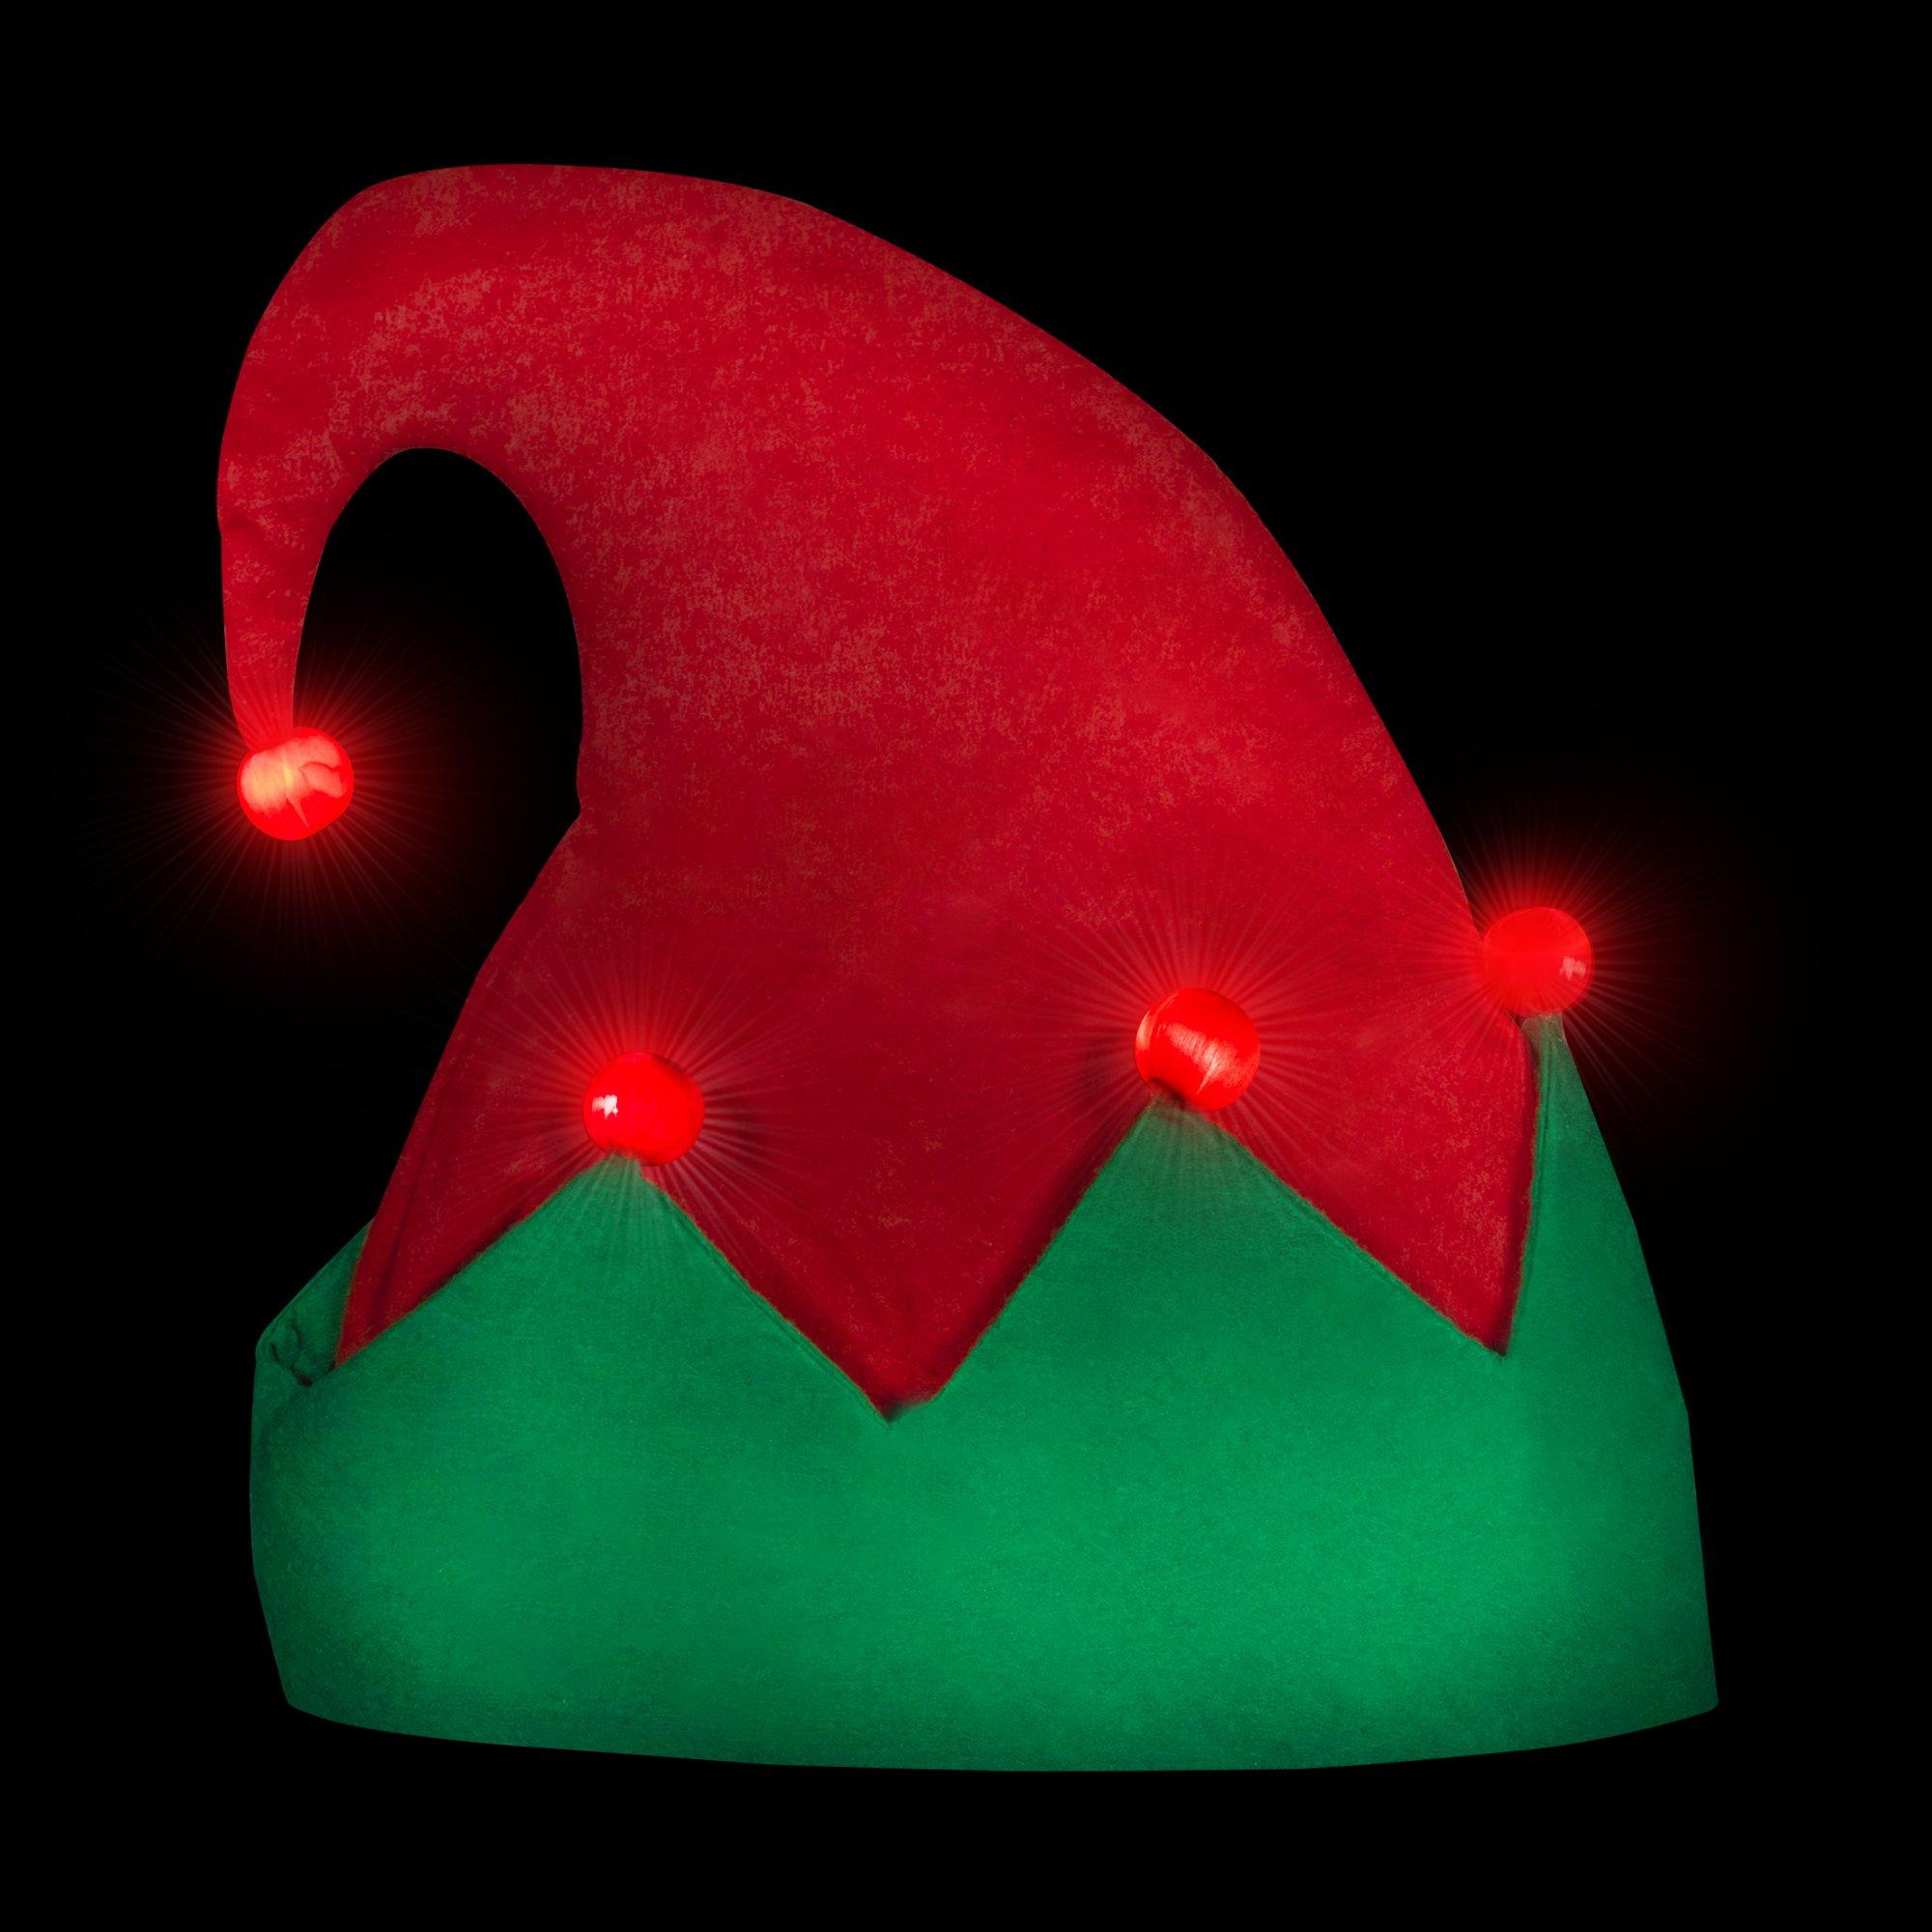 LED Light Up Festive Christmas Santa Elf Hat - Family 12 Pack by Windy City Novelties (Image #2)